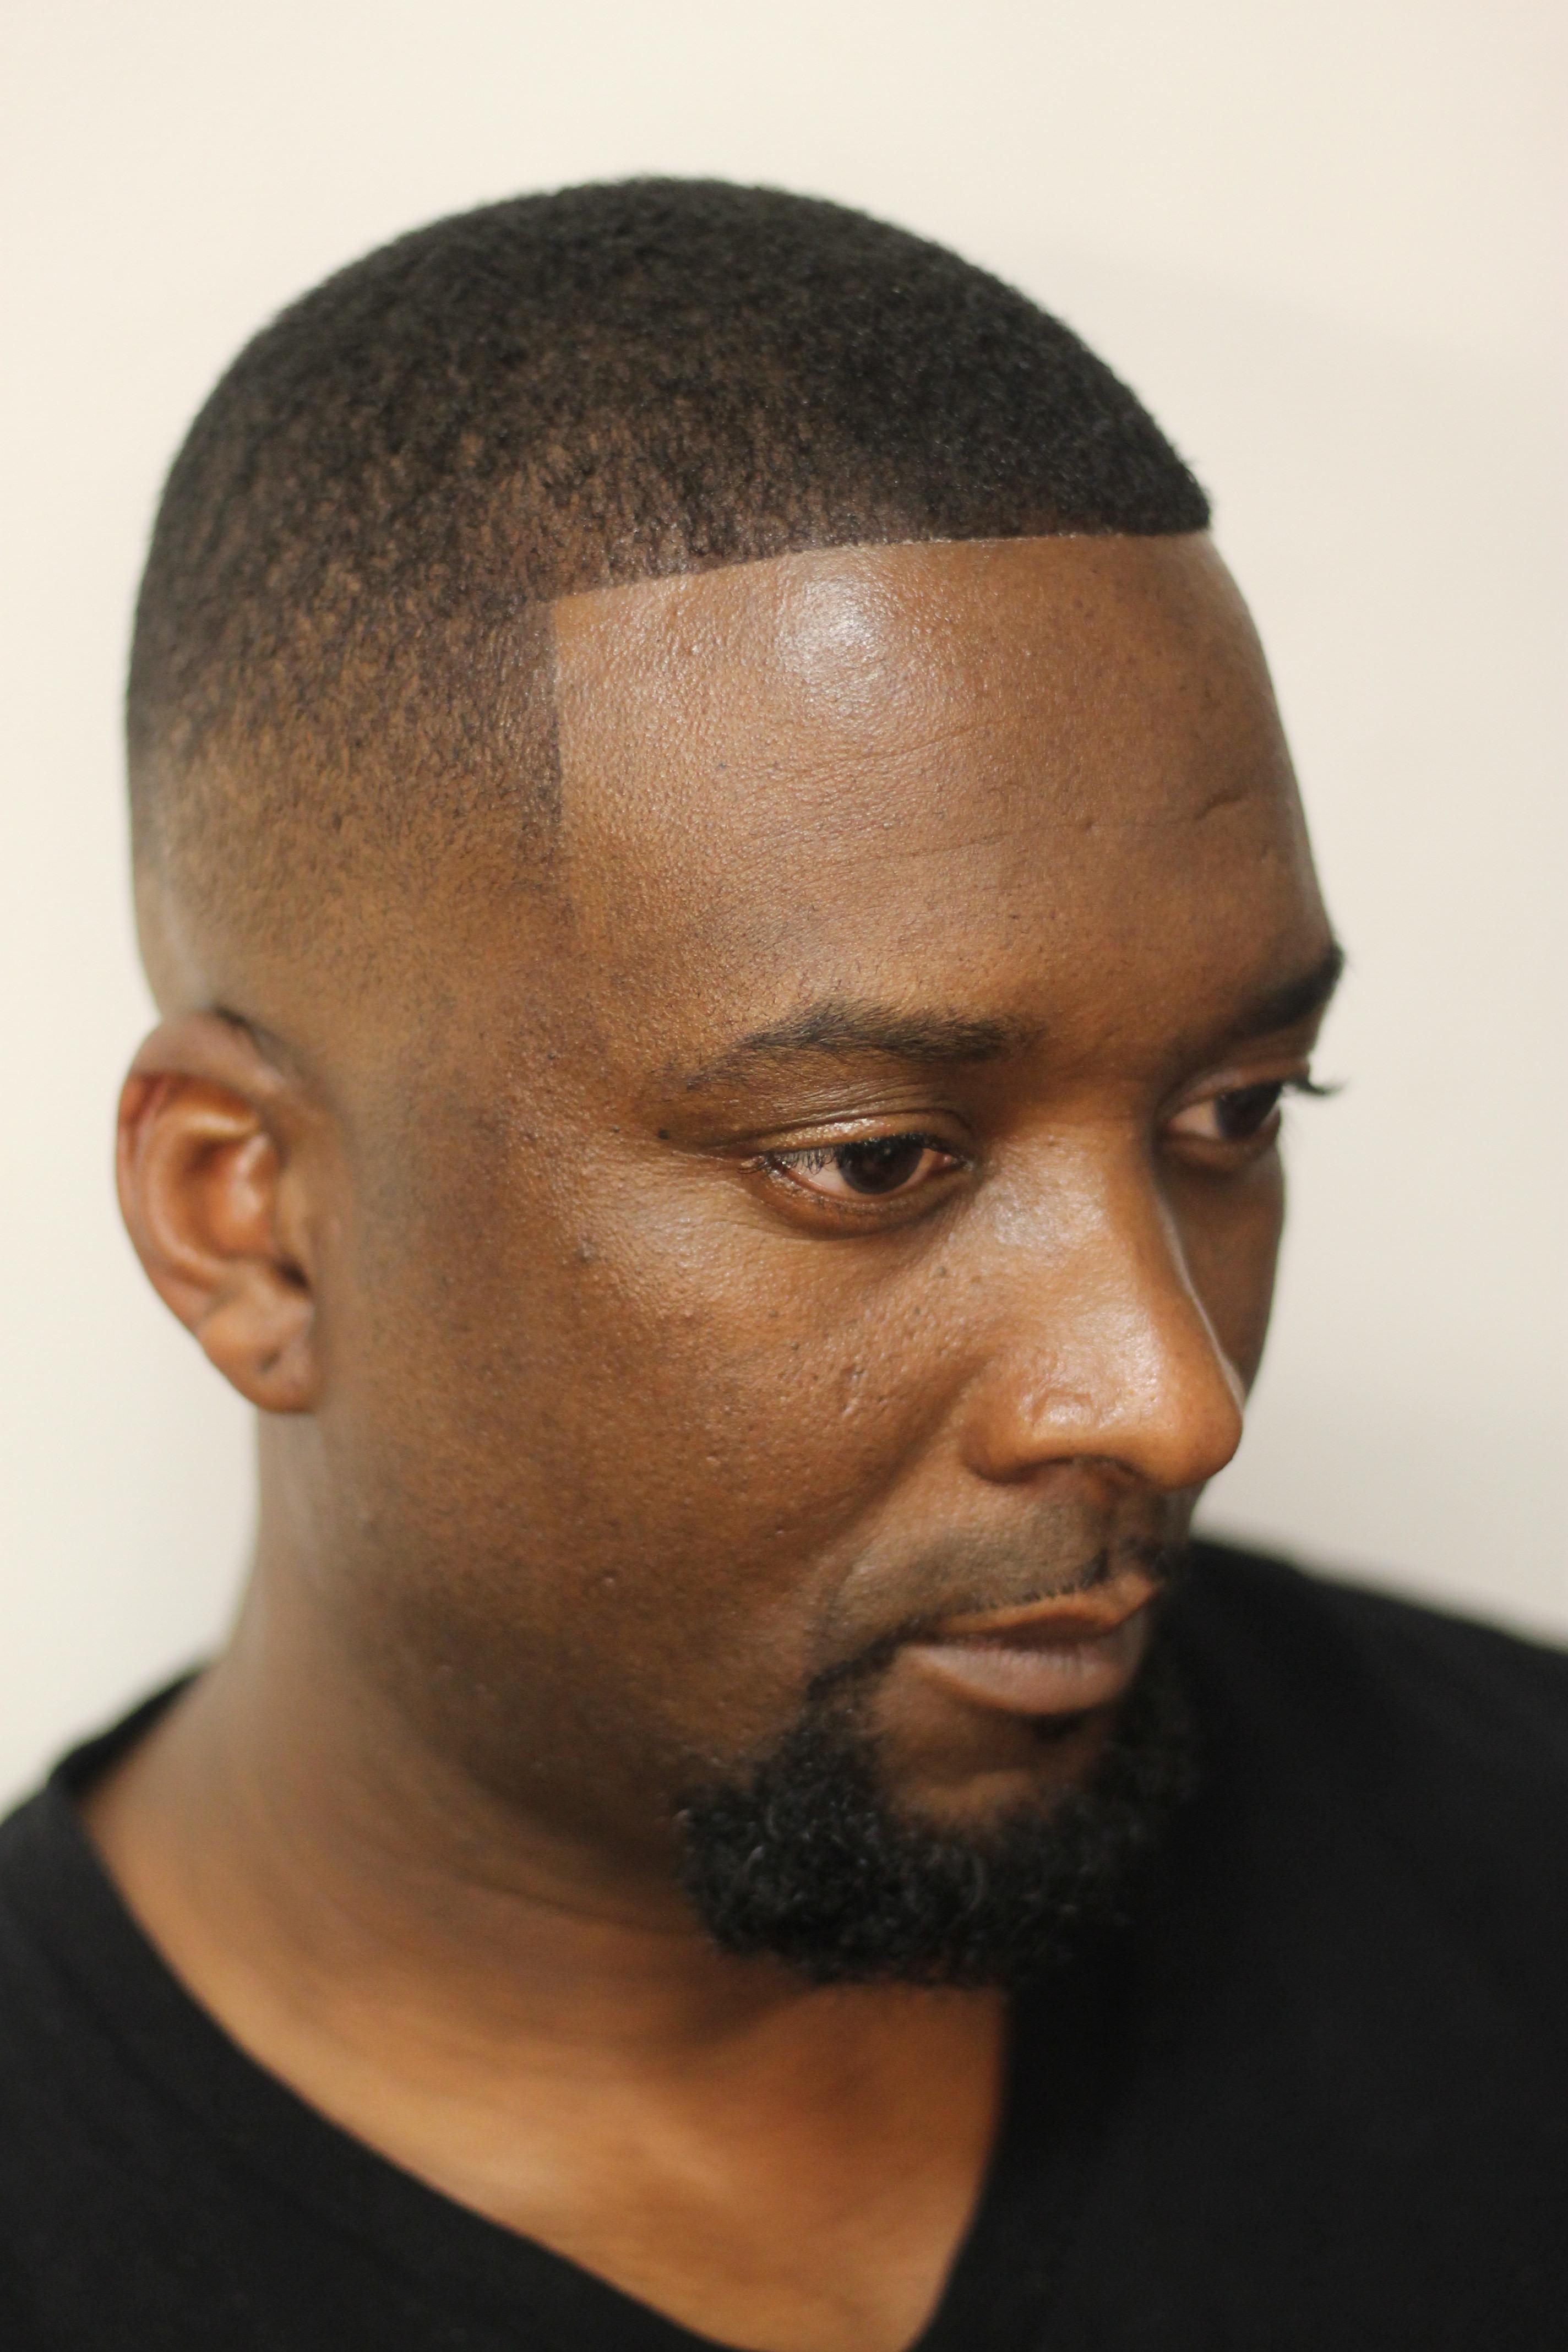 Bald Fade | Bald Taper Fade | Skin Fade Haircut